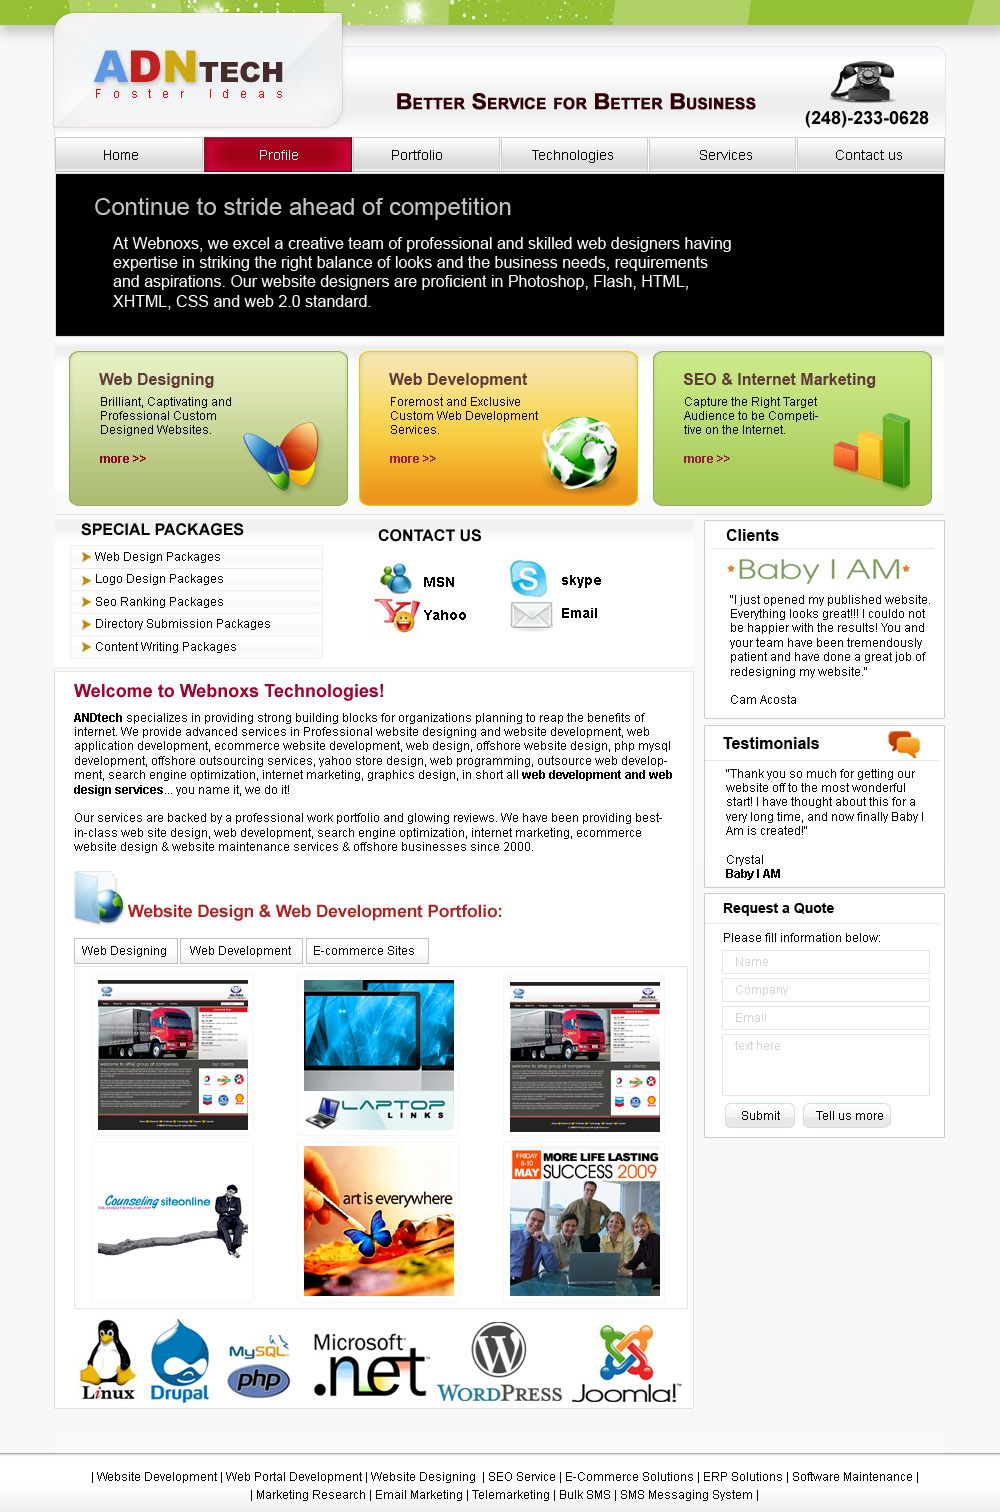 55 Practical Website User Interface Design Psd Psd Web Design User Interface Design Free Web Design